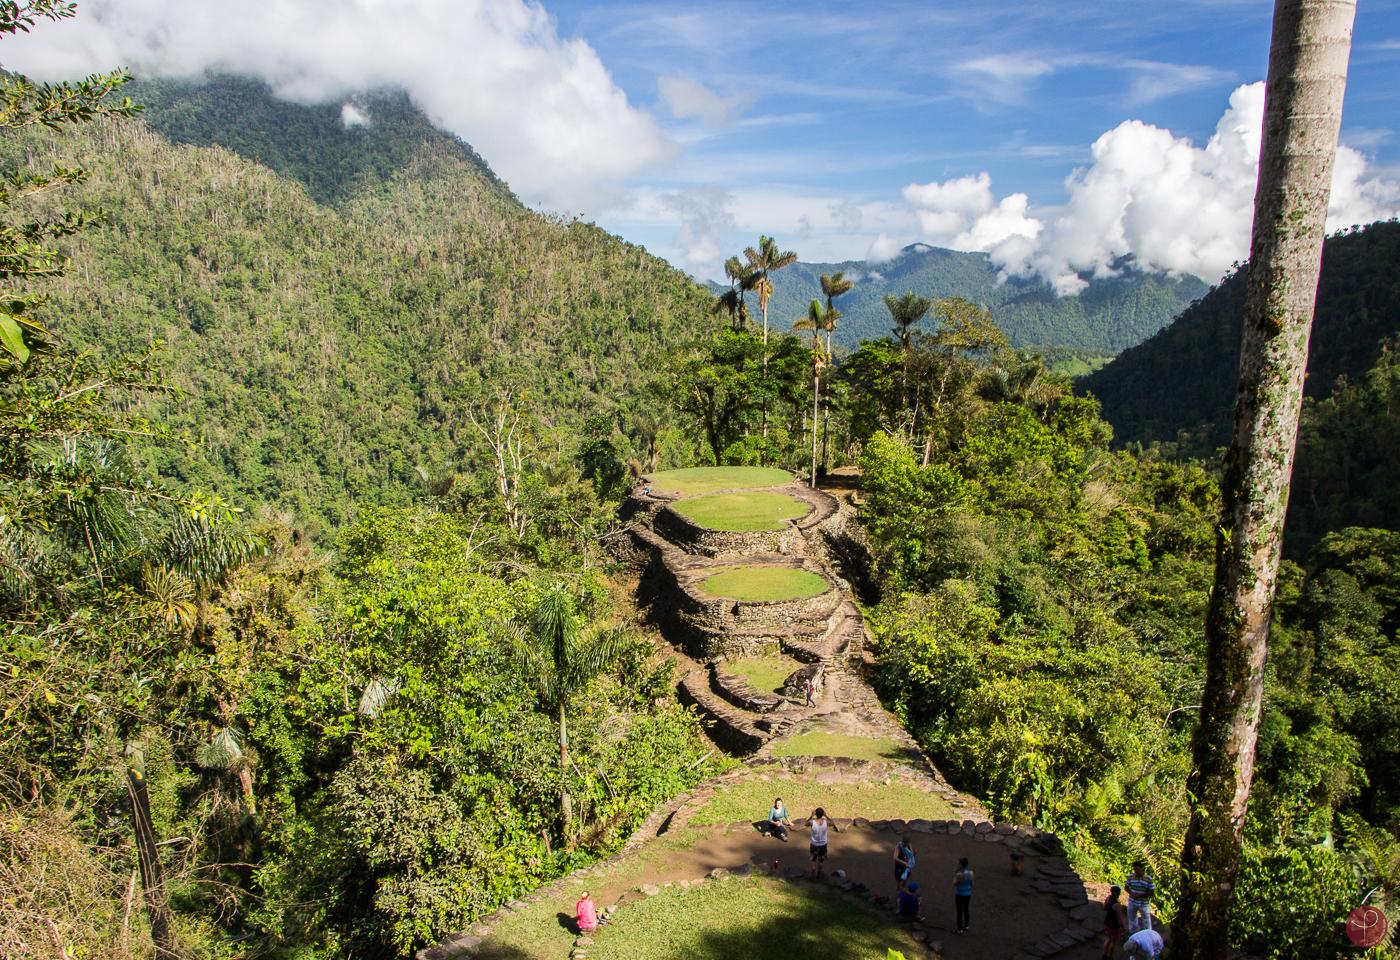 Voyage en Colombie, où aller en 2019 - Povécham